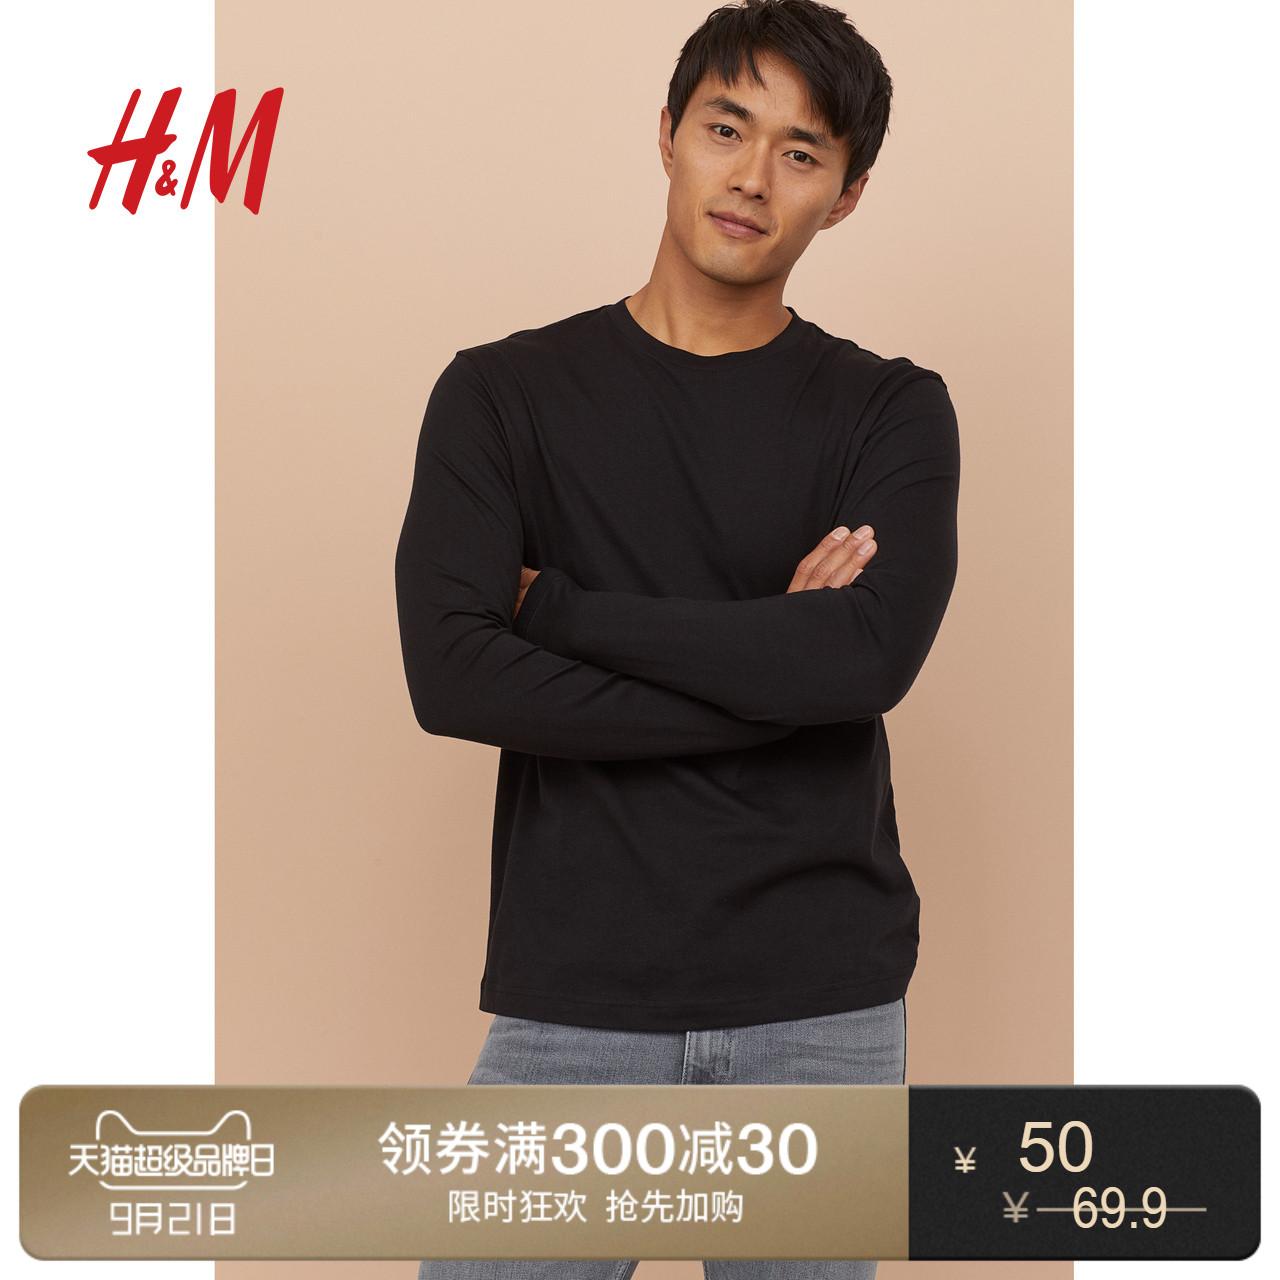 H&M男装体恤长袖T恤男男纯棉潮流休闲圆领上衣潮牌HM0596400